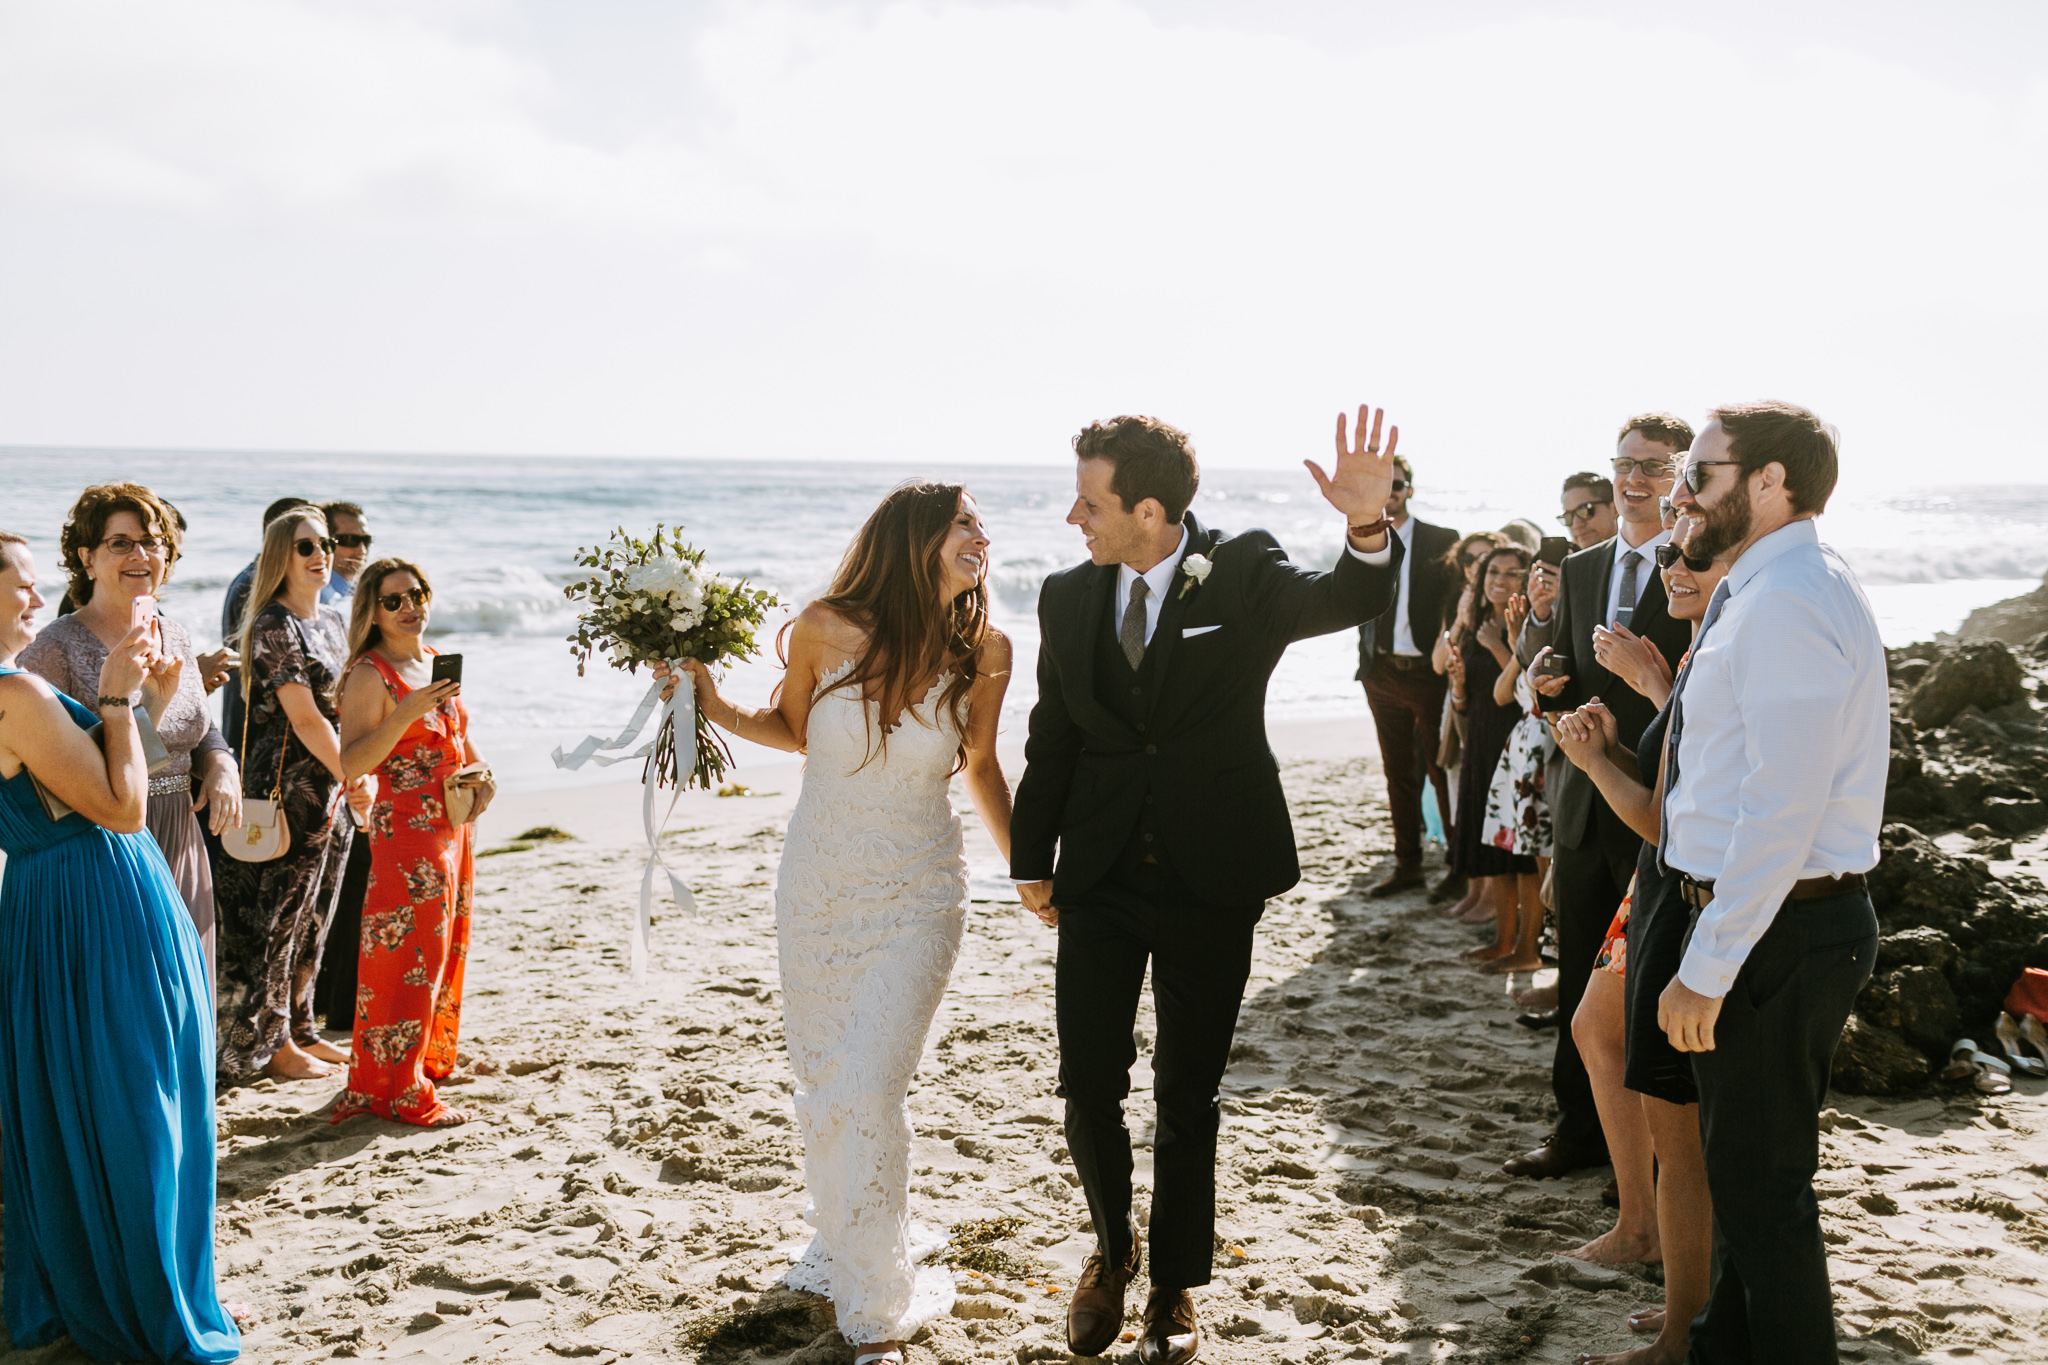 LagunaBeach-WeddingPhotographer-40.jpg